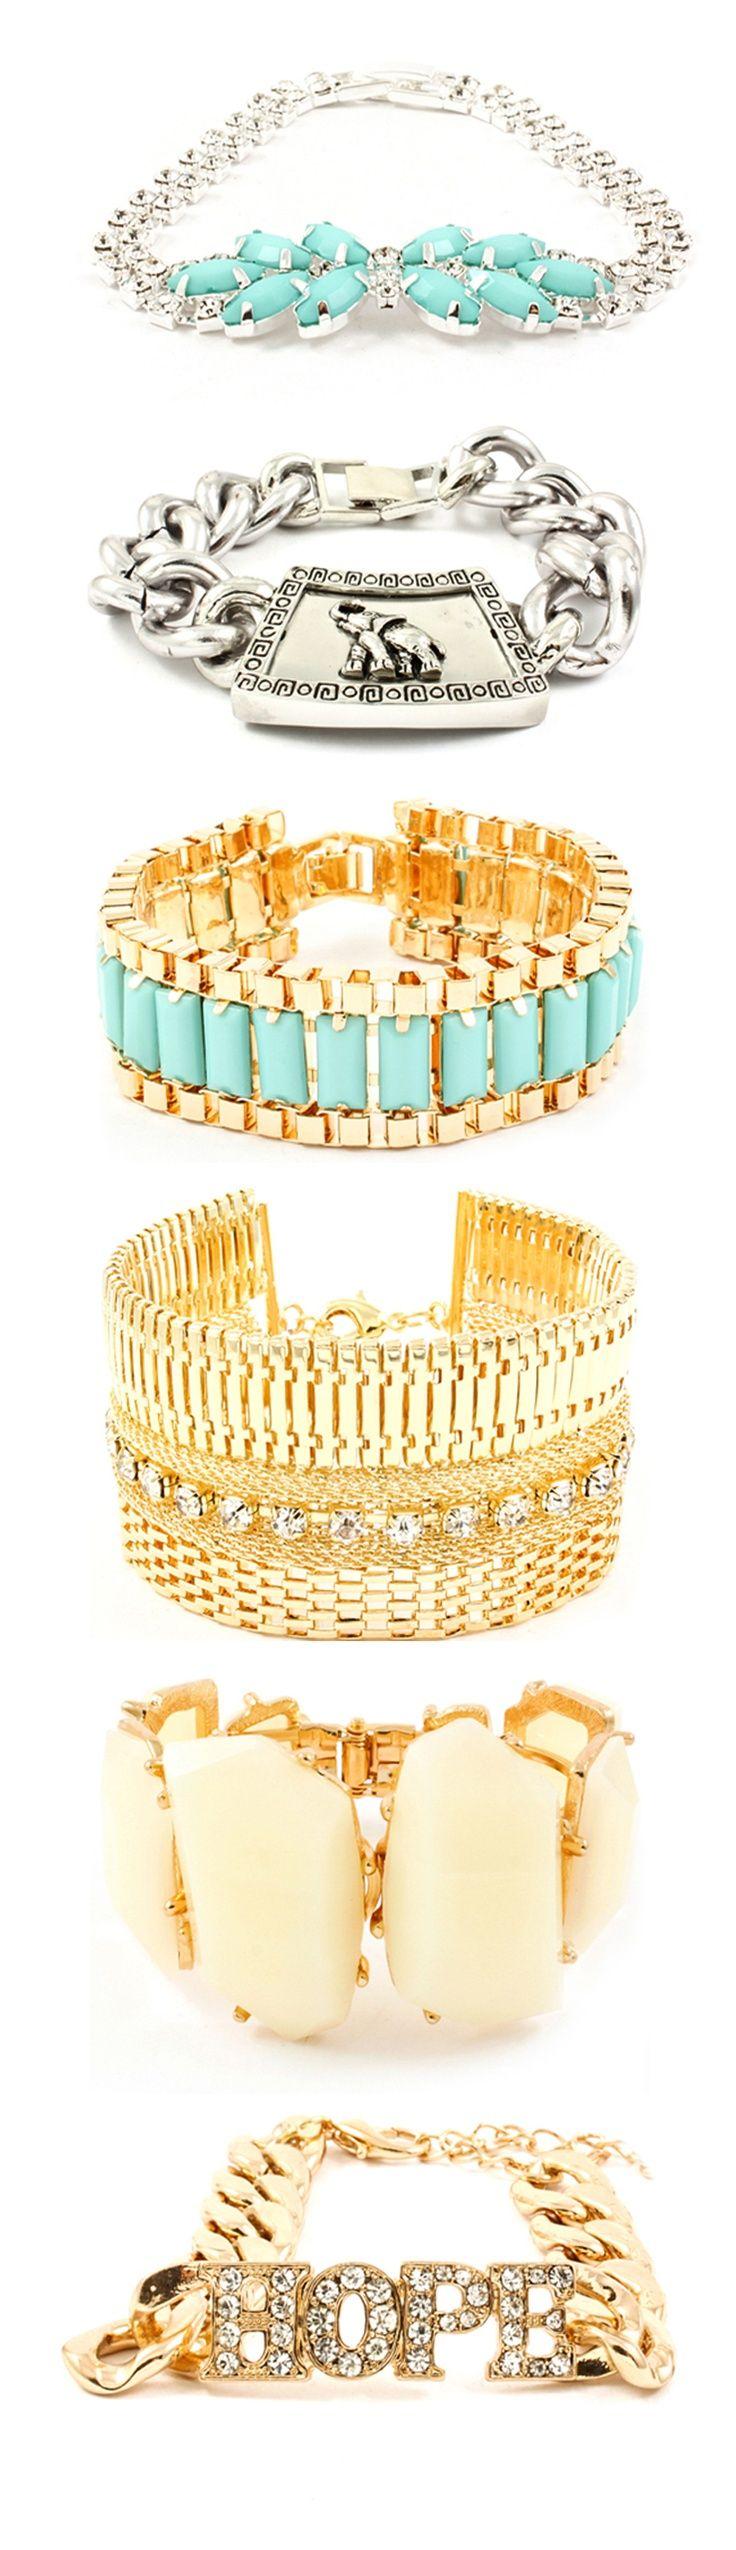 Arm Candy Bracelets <3 http://www.emmastine.com/index.php?campaign=type294=HardPin=Pinterest=HSESL